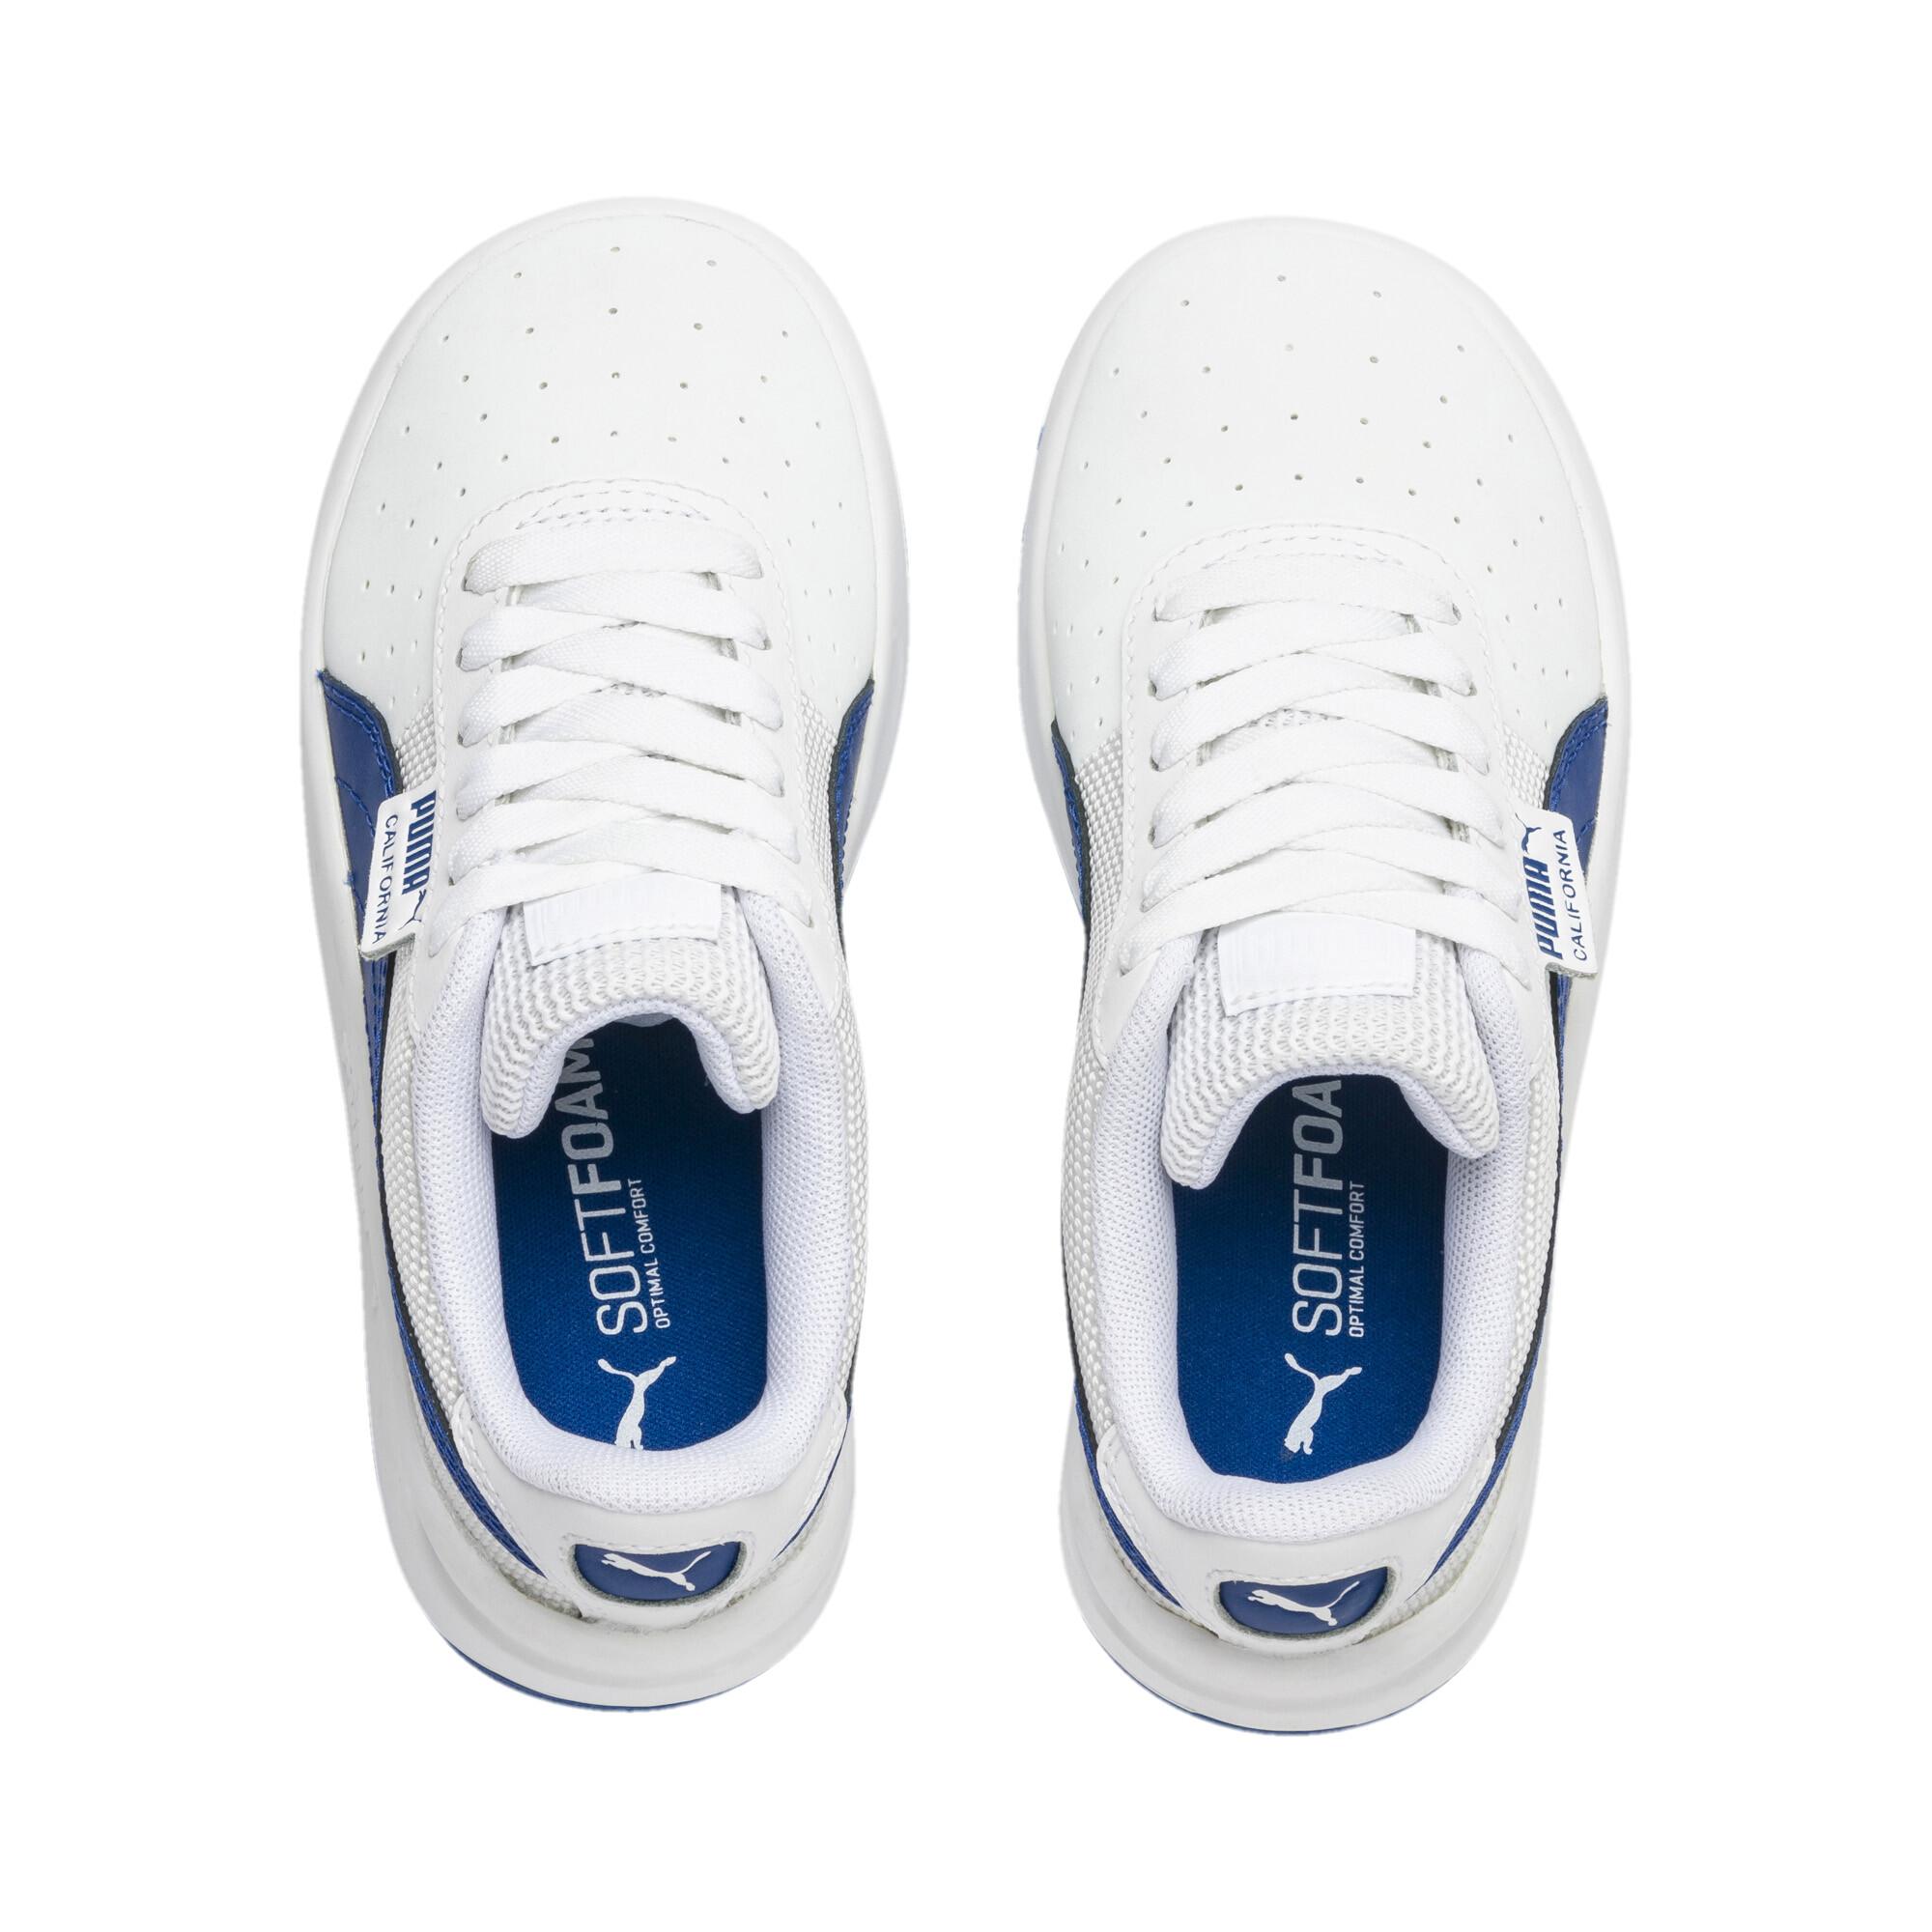 PUMA-California-Little-Kids-039-Shoes-Kids-Shoe-Kids thumbnail 13